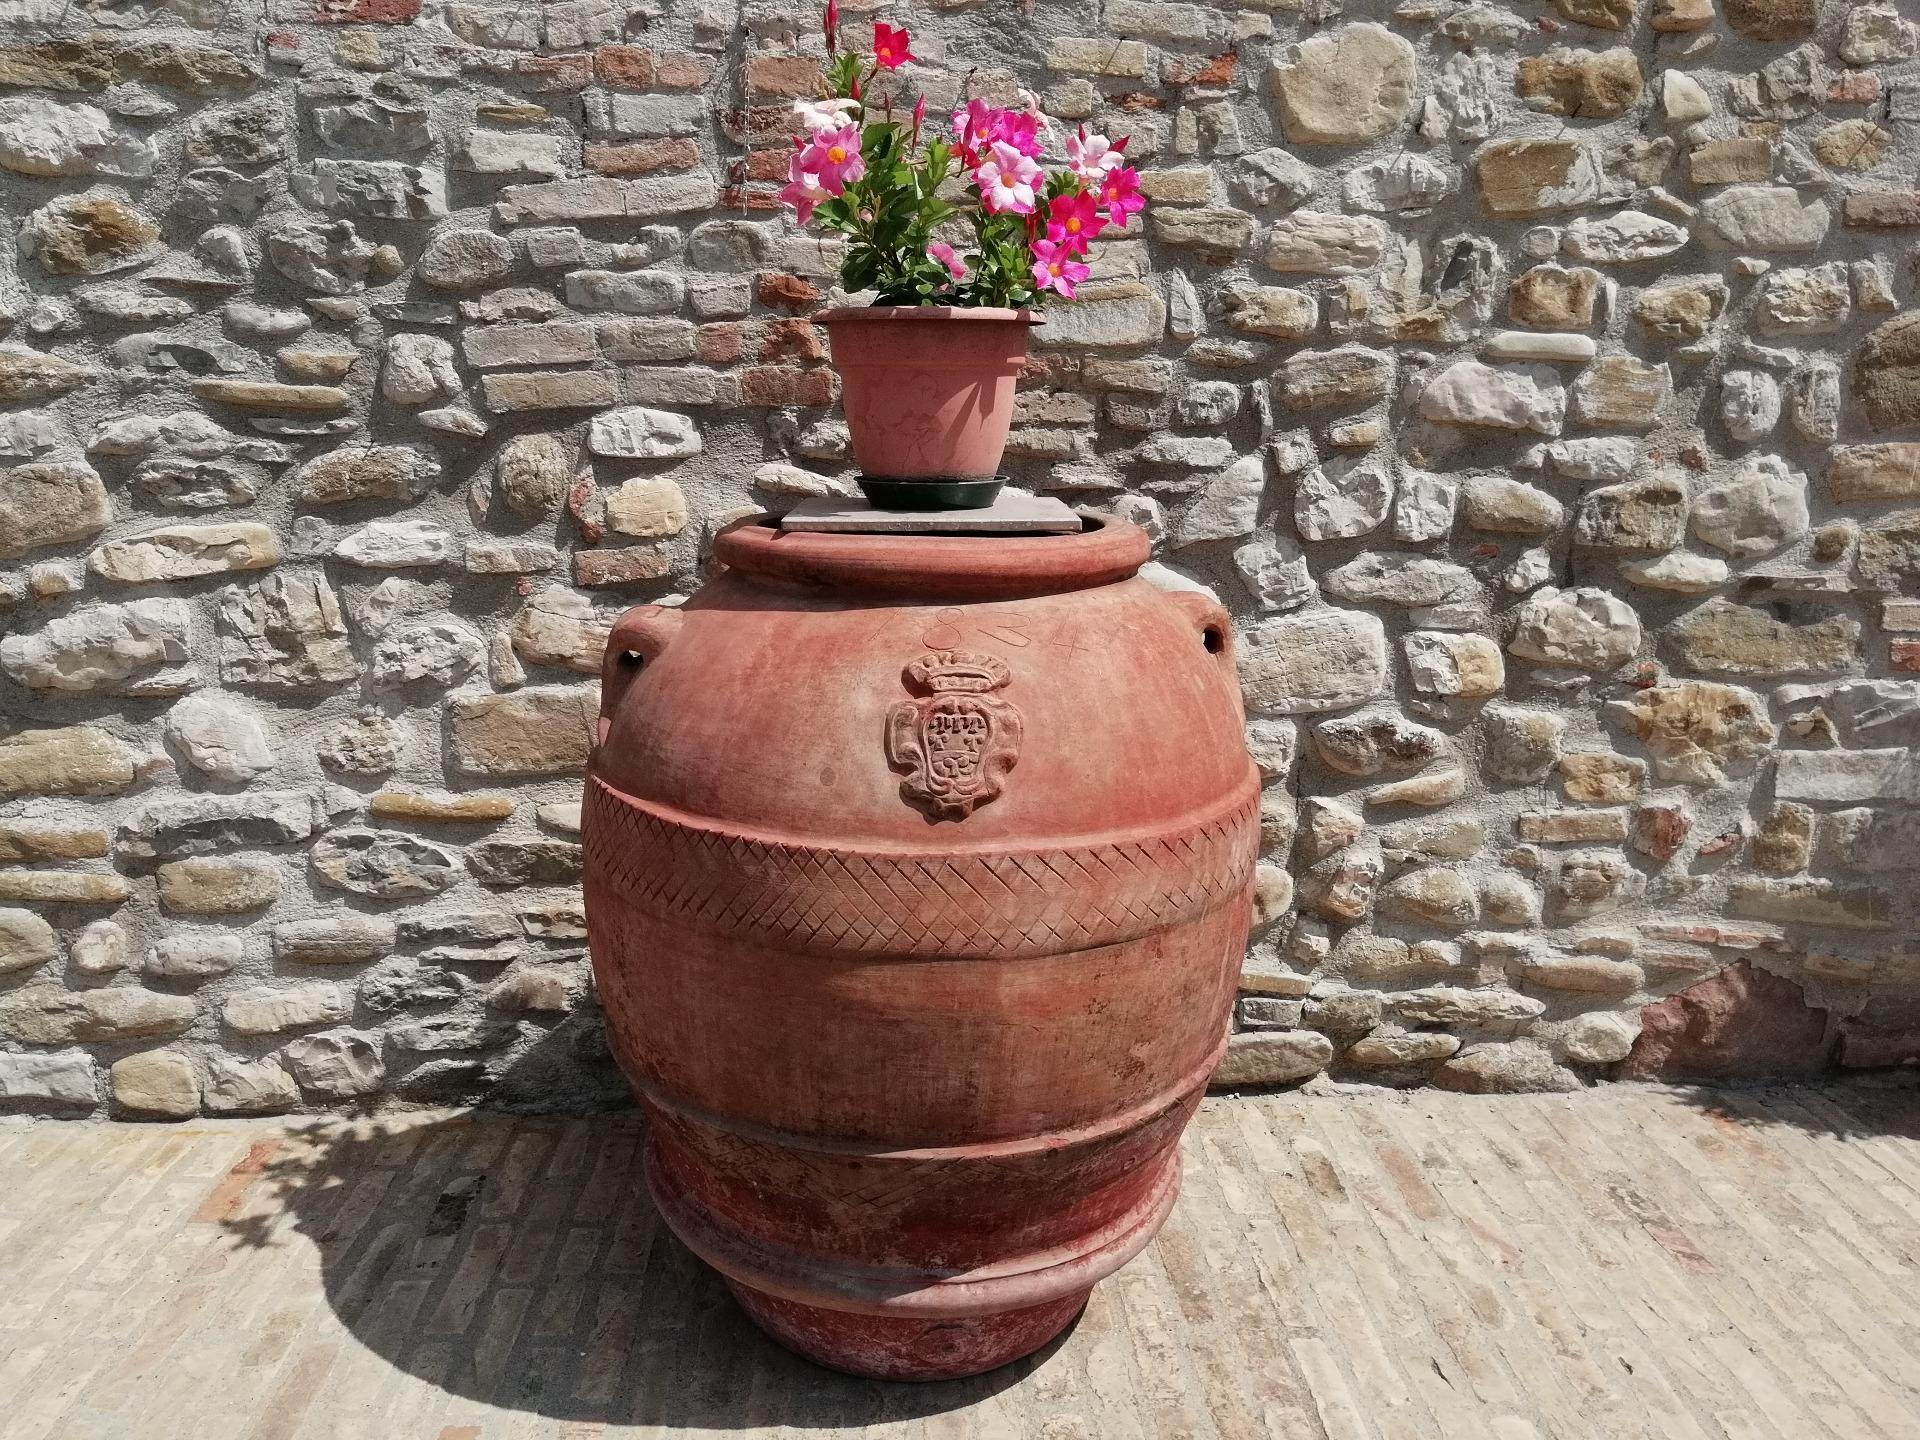 Datazione terracotta ceramiche